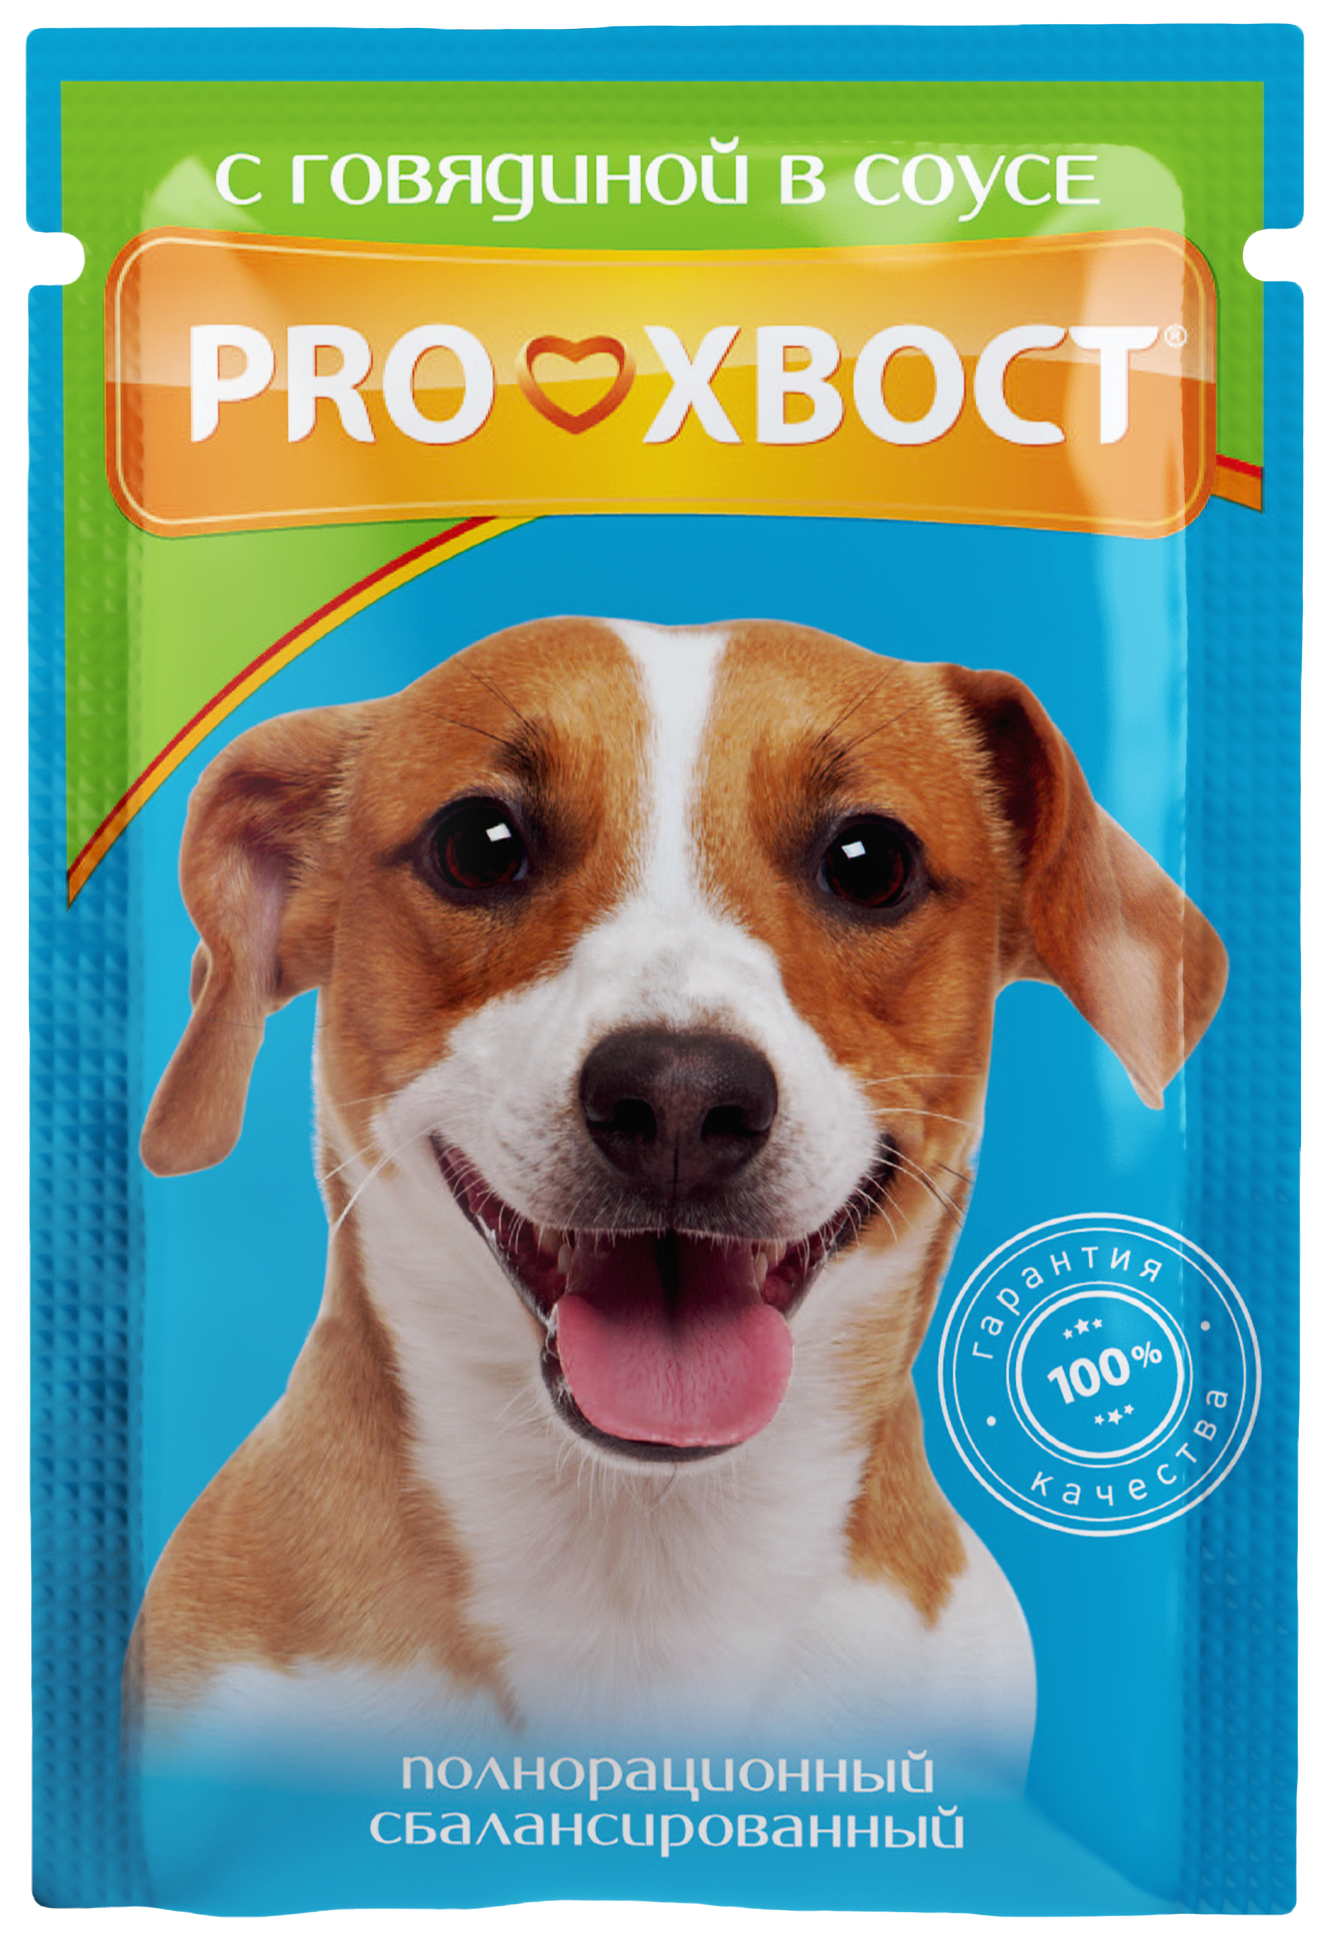 ProХвост Пауч ProХвост для собак говядина в соусе, упаковка-25шт. PH_dog_beef_85.png